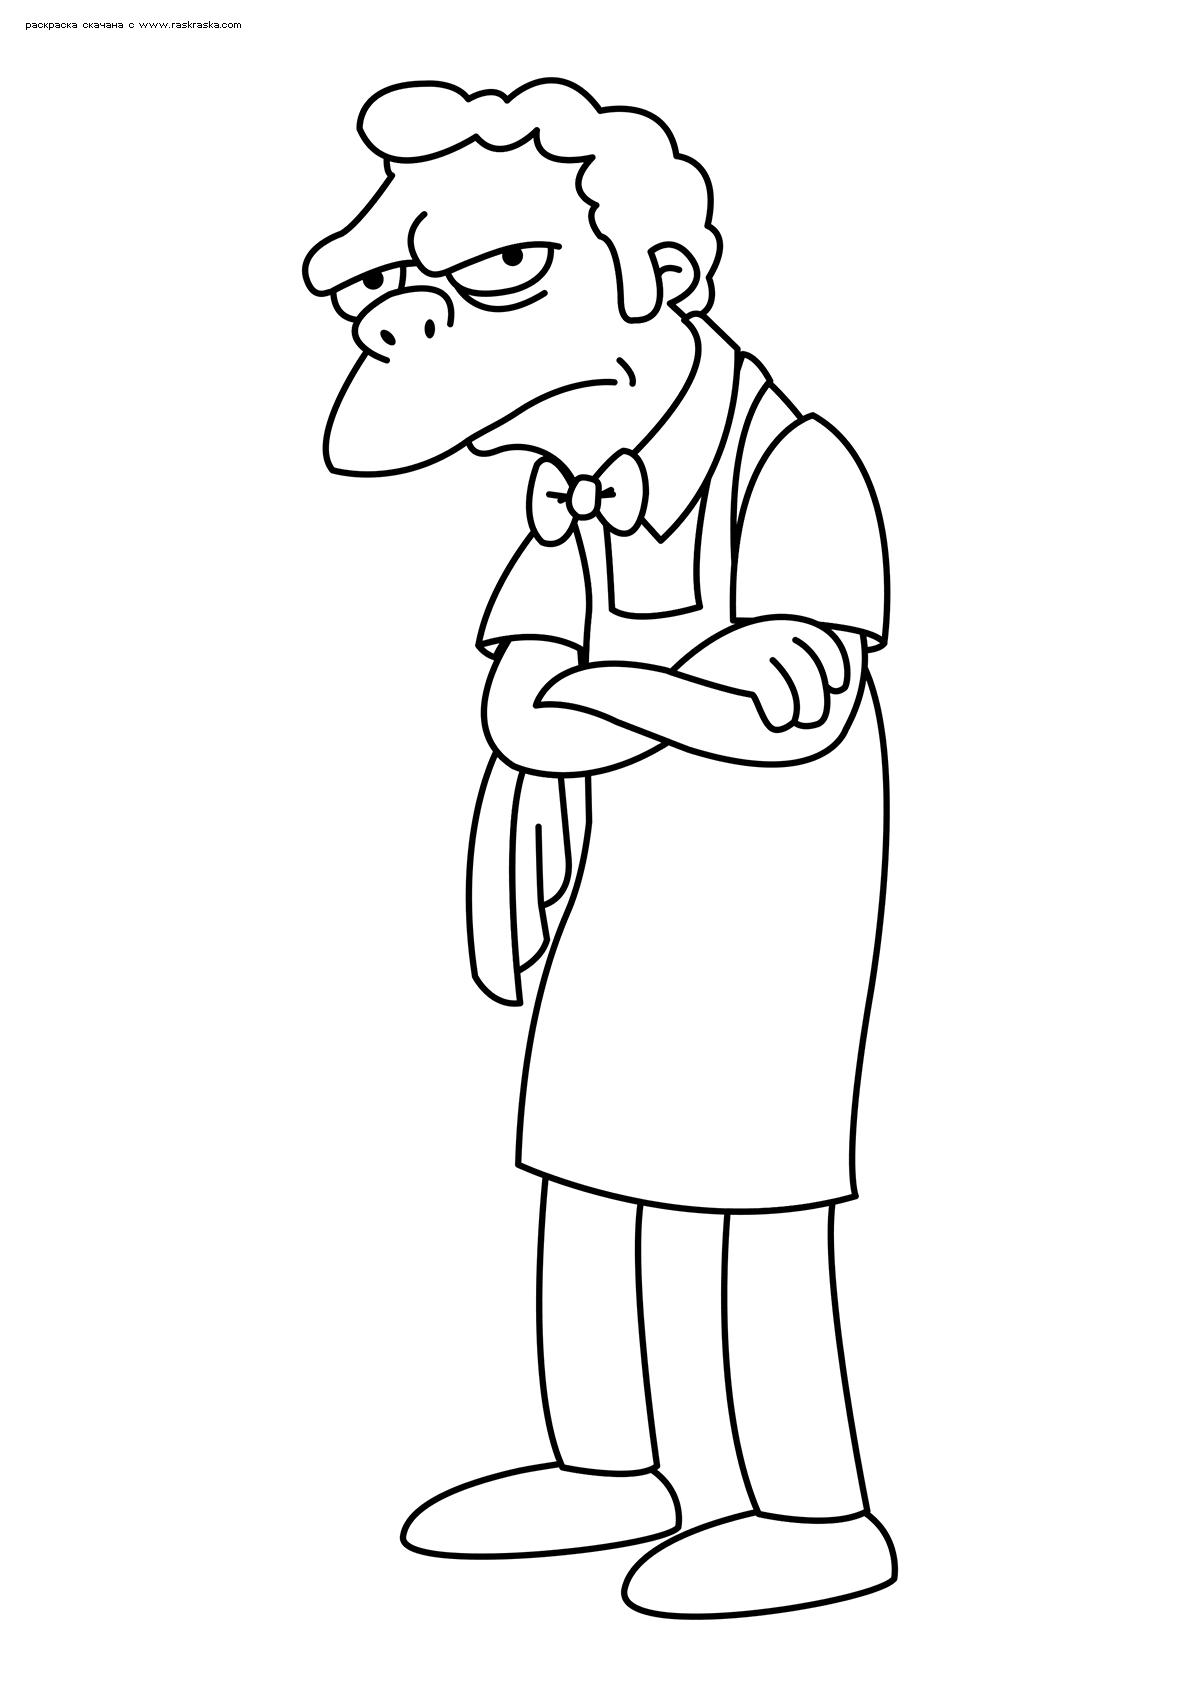 Раскраска Бармен Мо. Раскраска Симпсоны